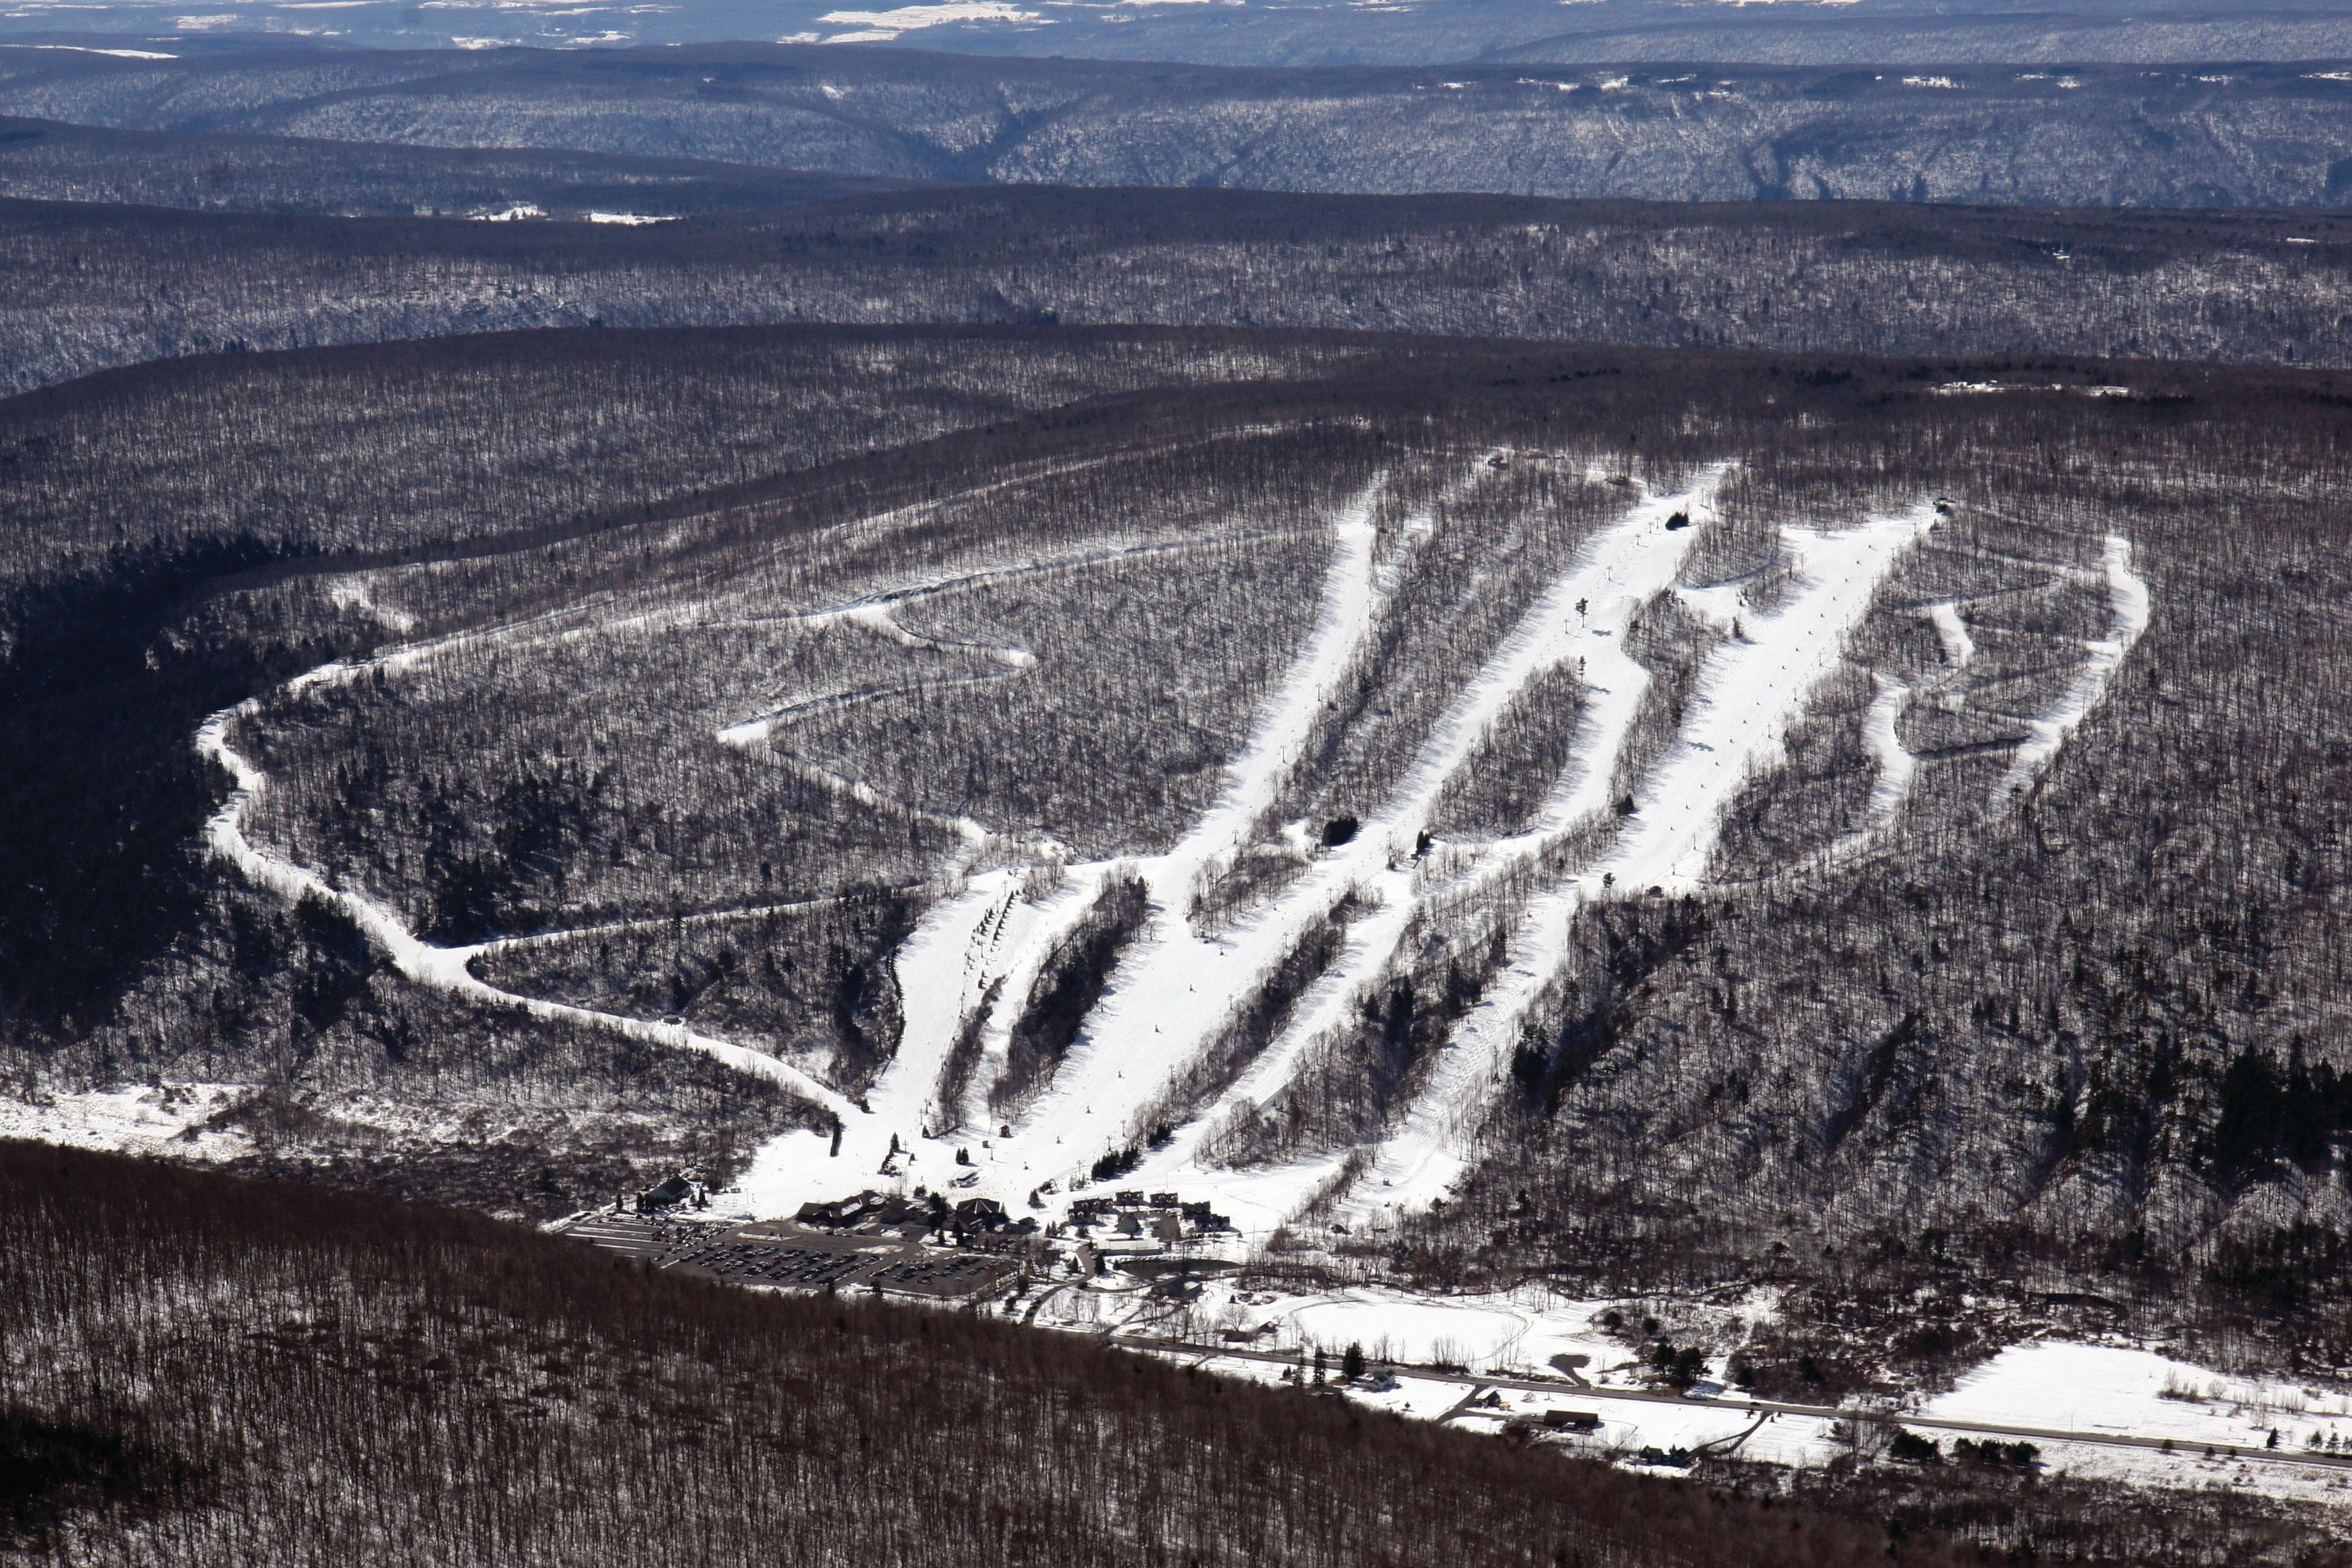 bristol mountain ski resort - wikiwand